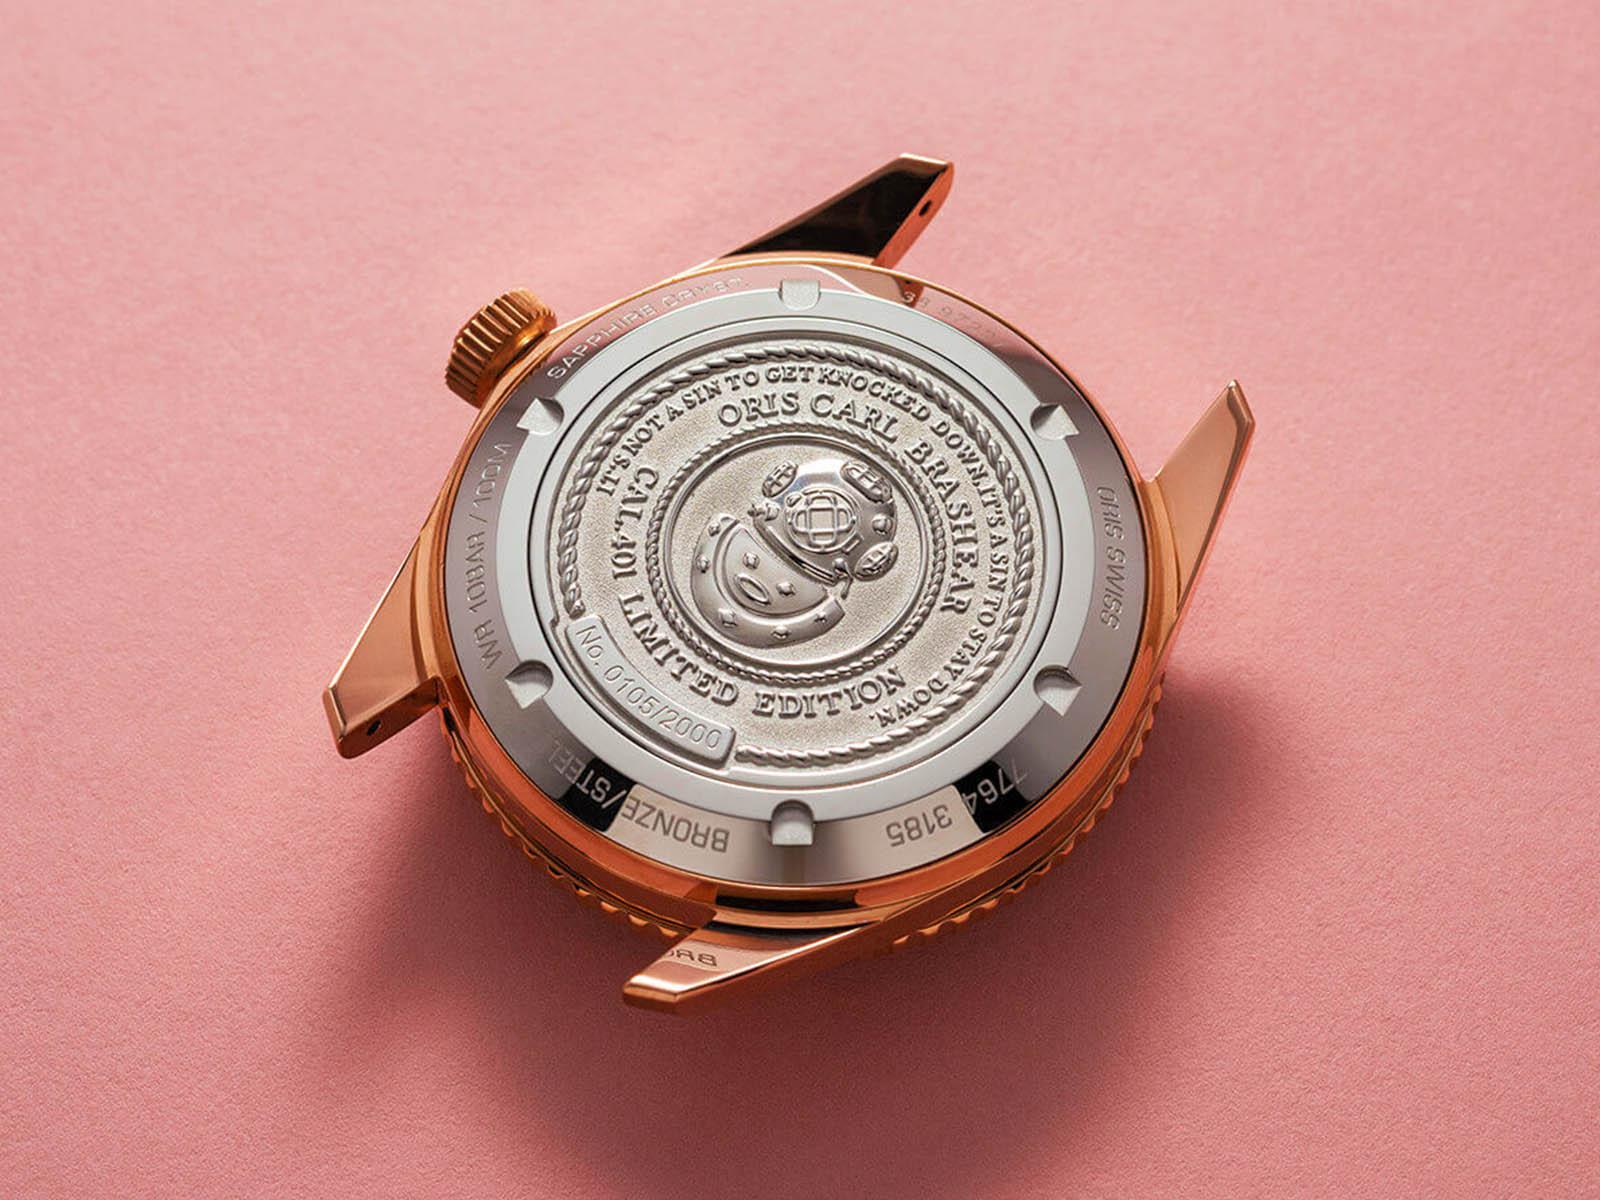 01-401-7764-3185-set-oris-carl-brashear-calibre-401-limited-edition-7.jpg